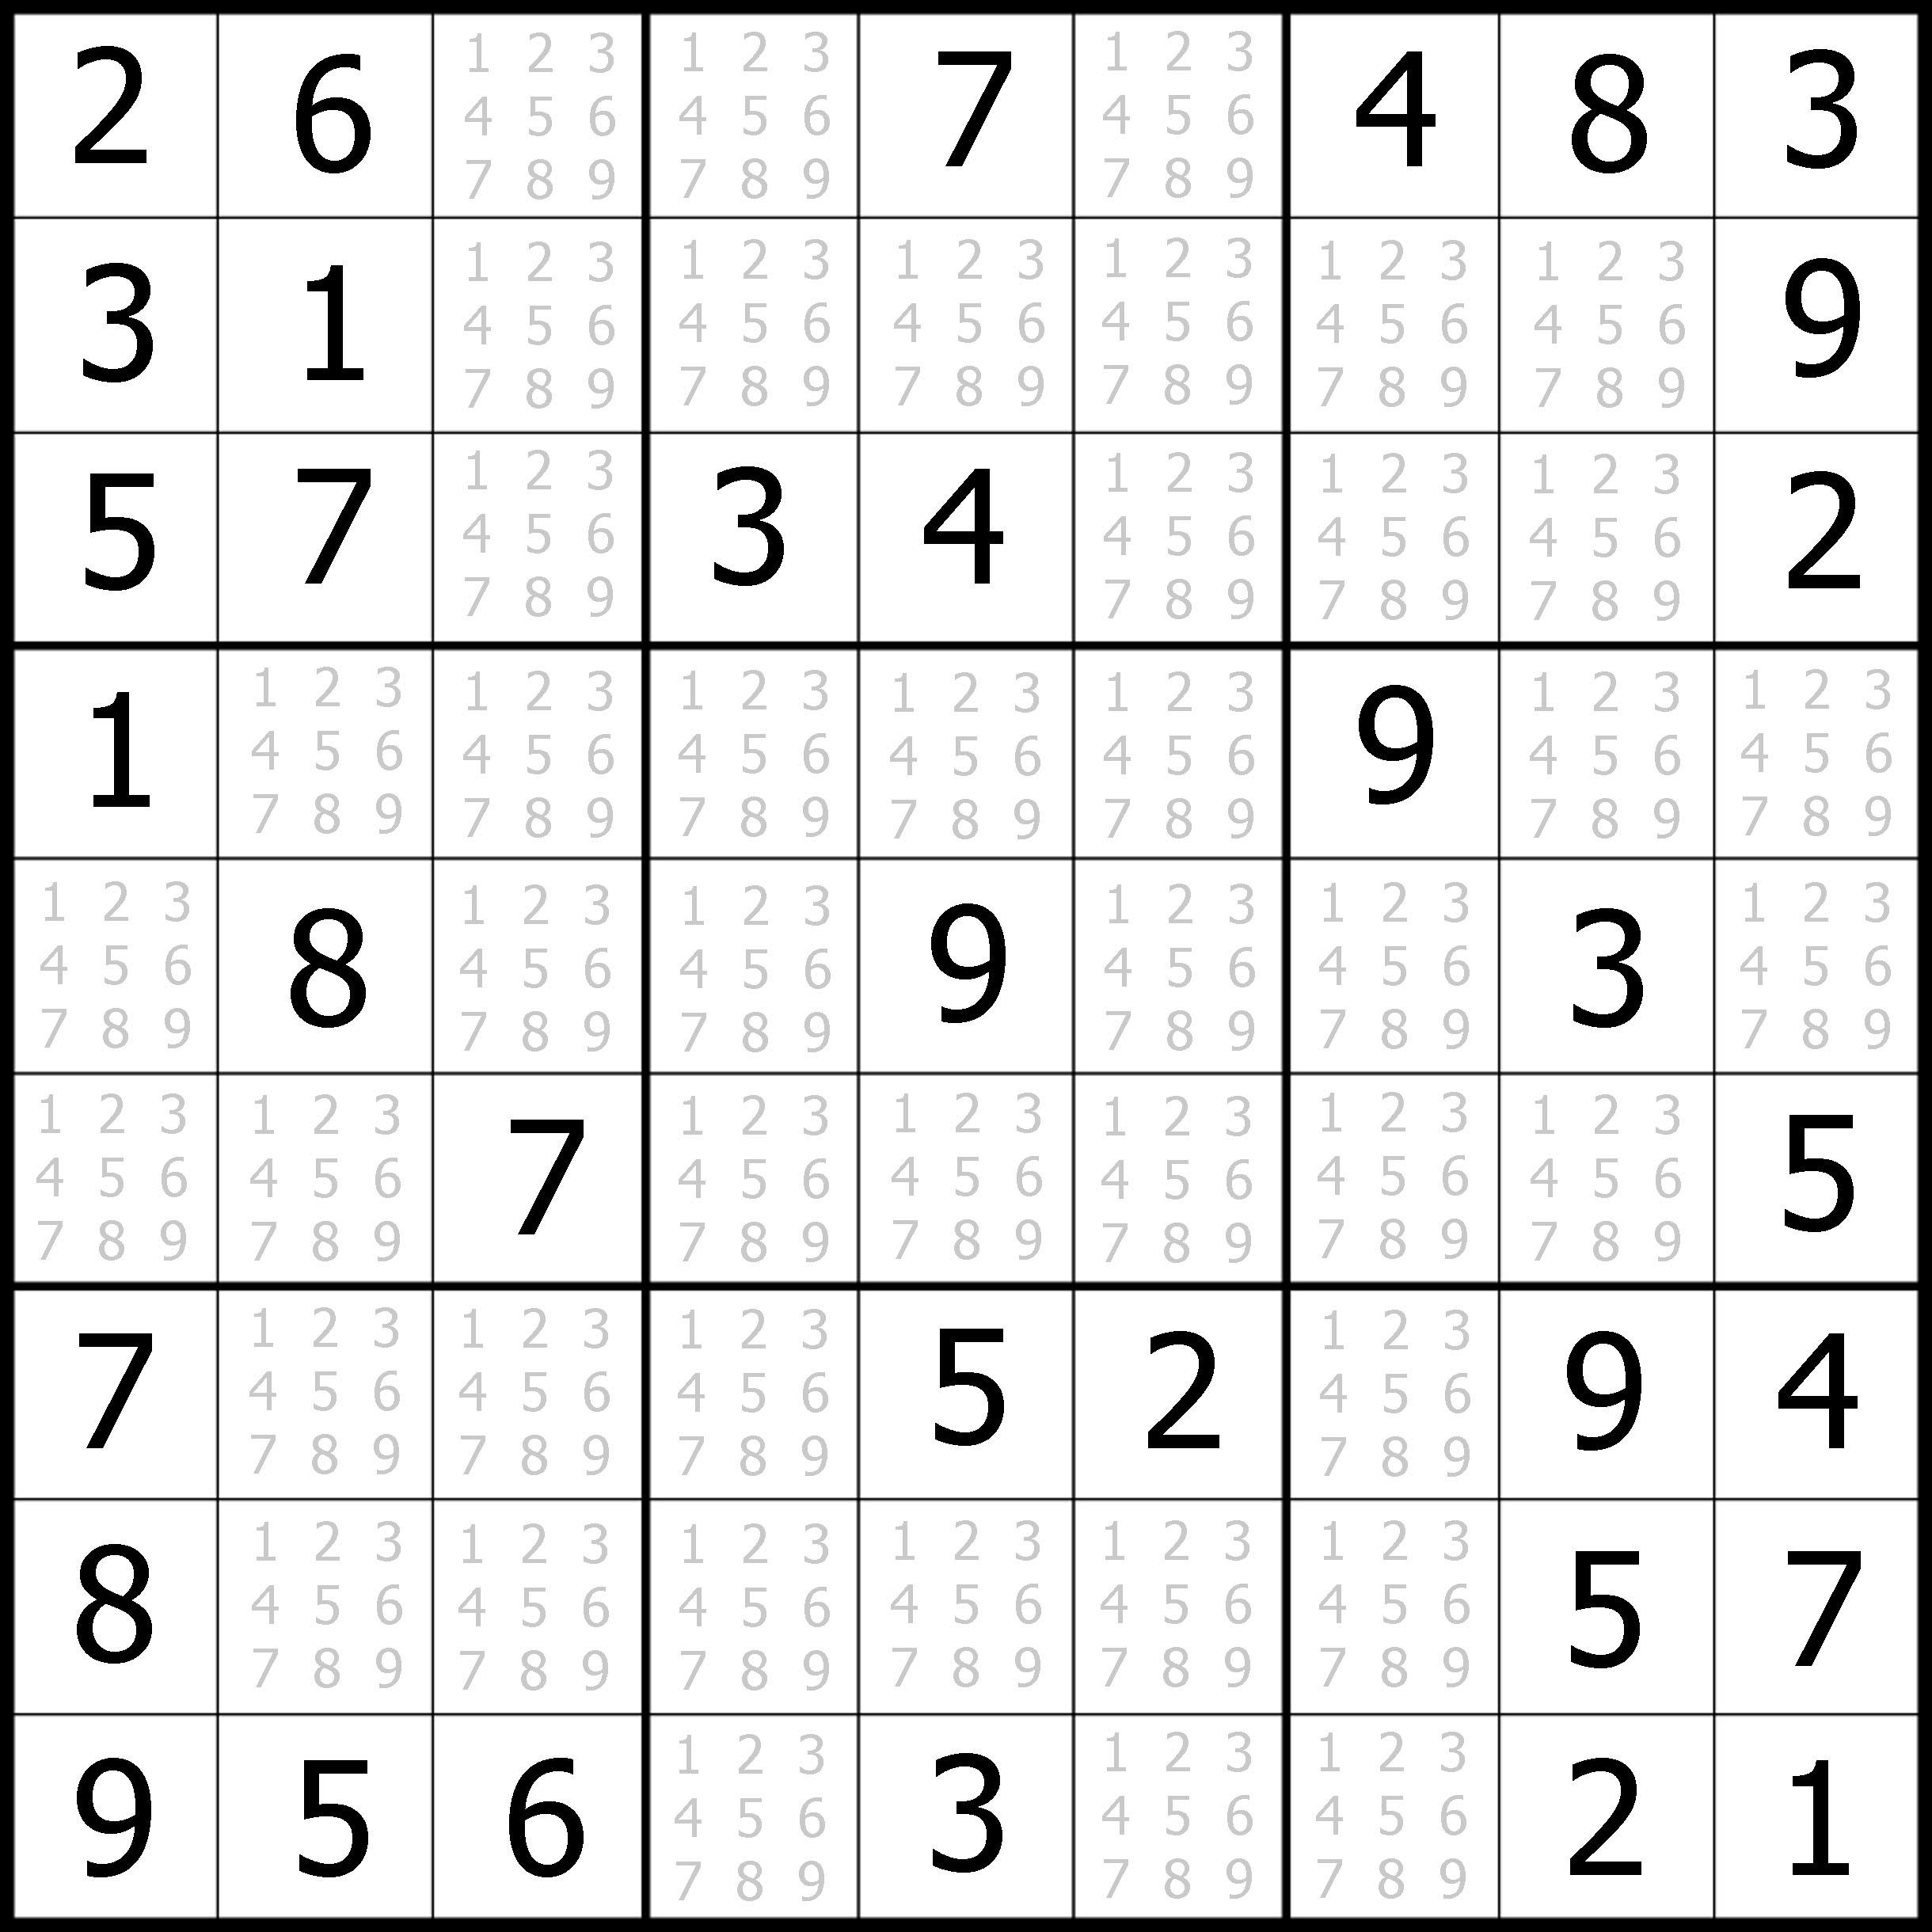 Easy Sudoku Printable | Kids Activities - Free Printable Sudoku